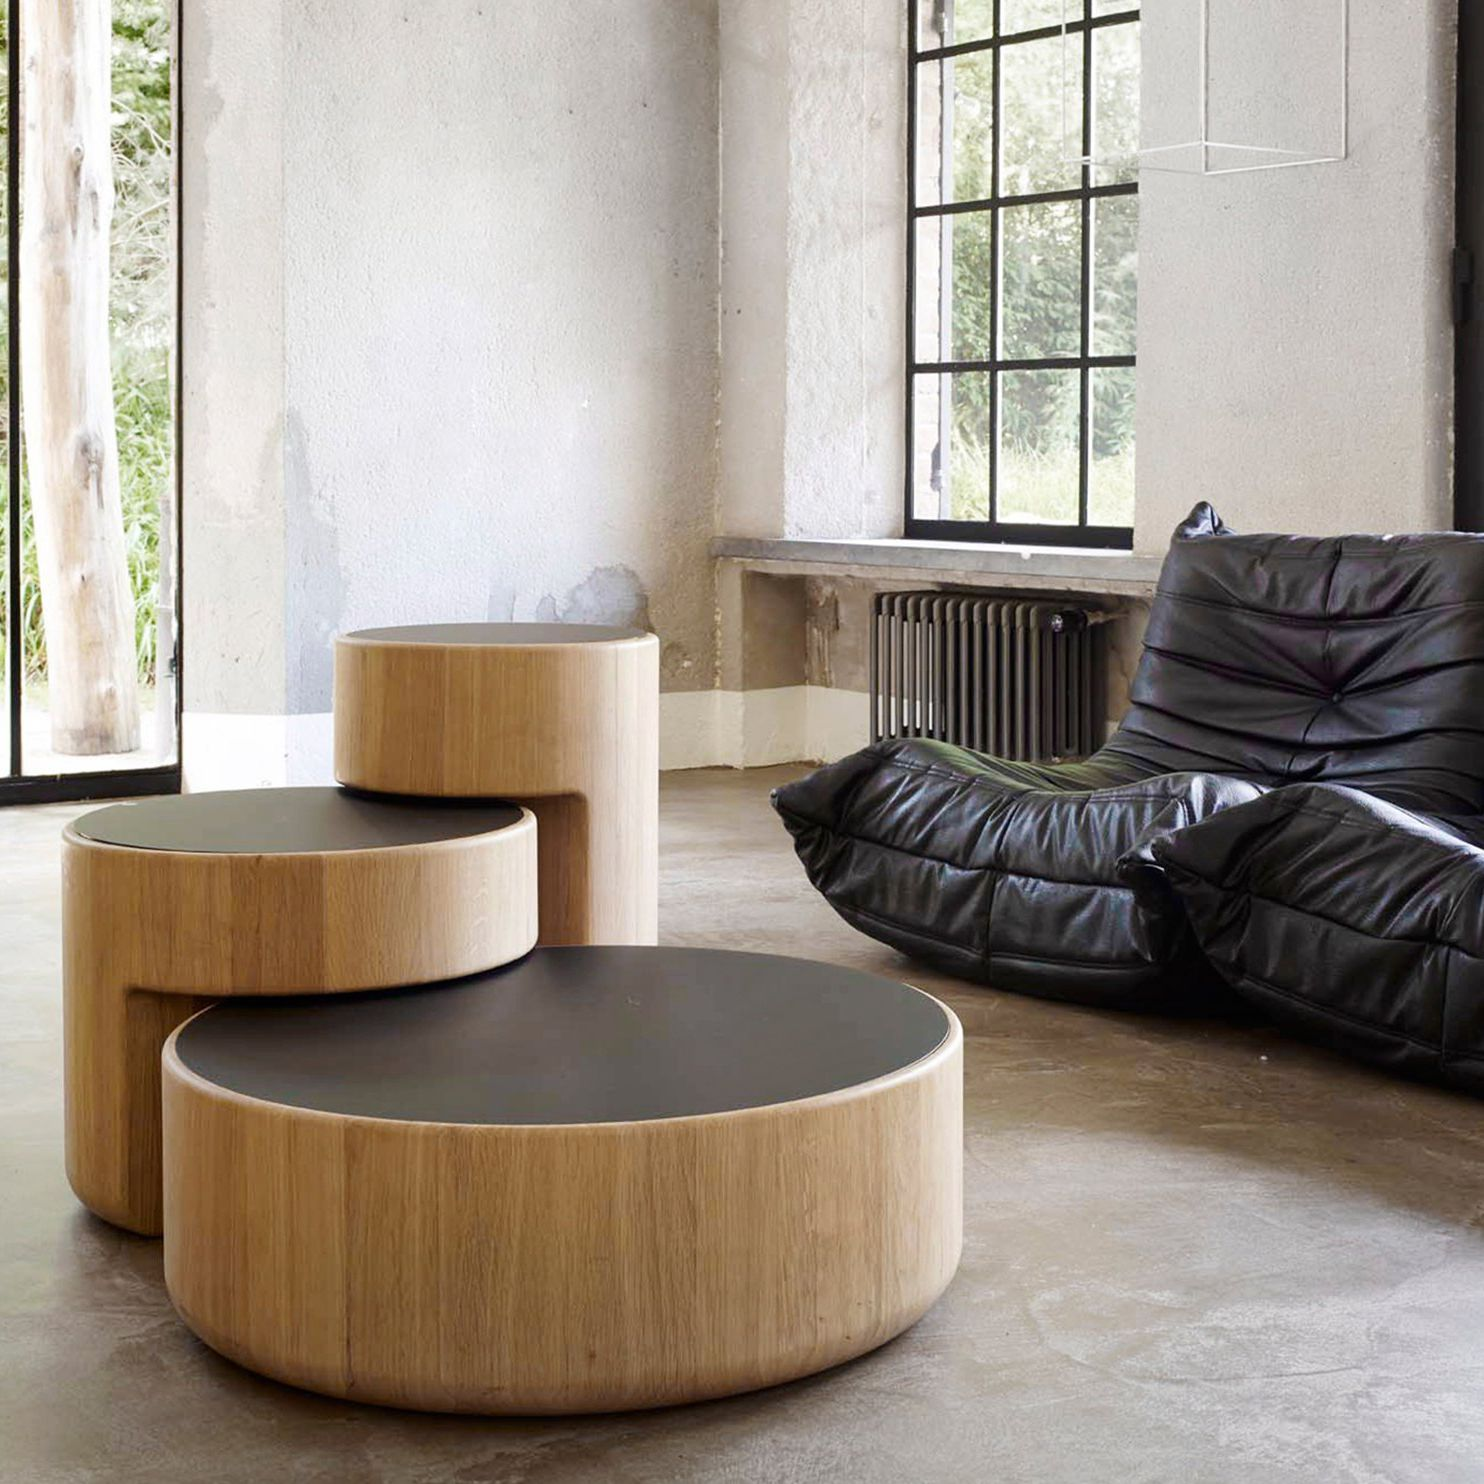 Contemporary Nesting Tables / Oak / Solid Wood / Glass   LEVELS By Lucie  Koldova U0026 Dan Yeffet